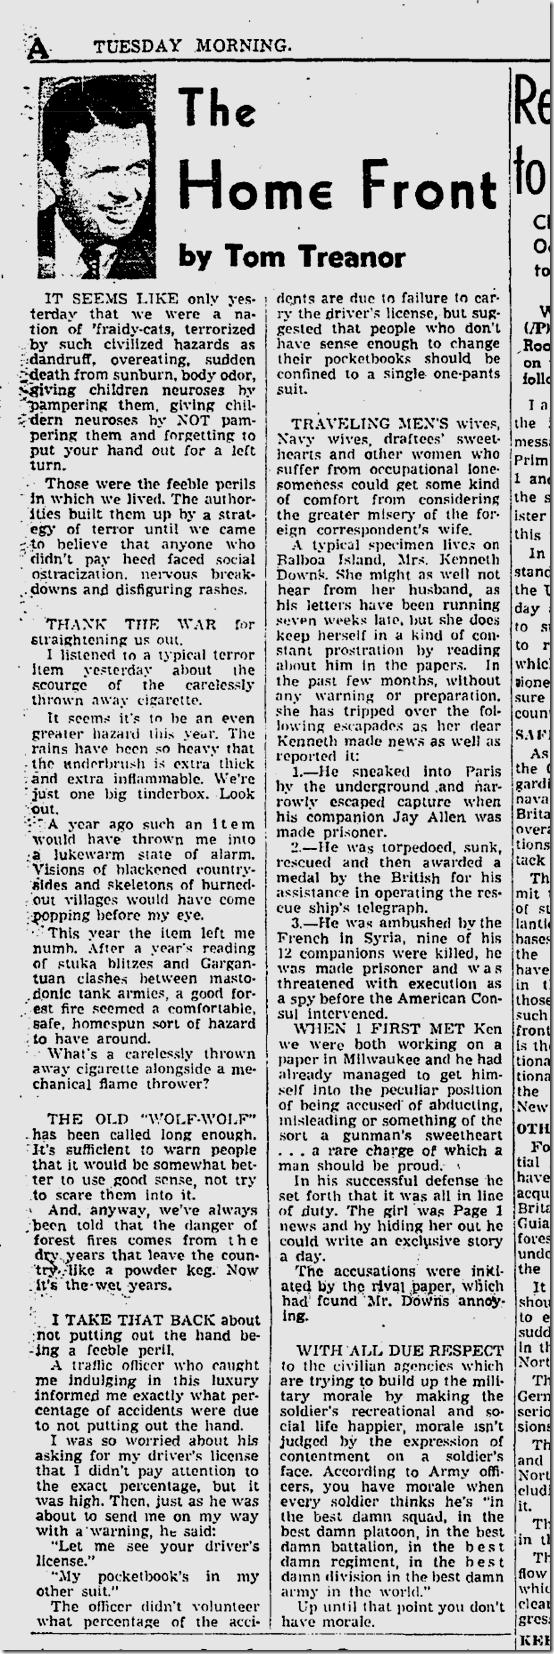 Tom Treanor, June 8, 1941,